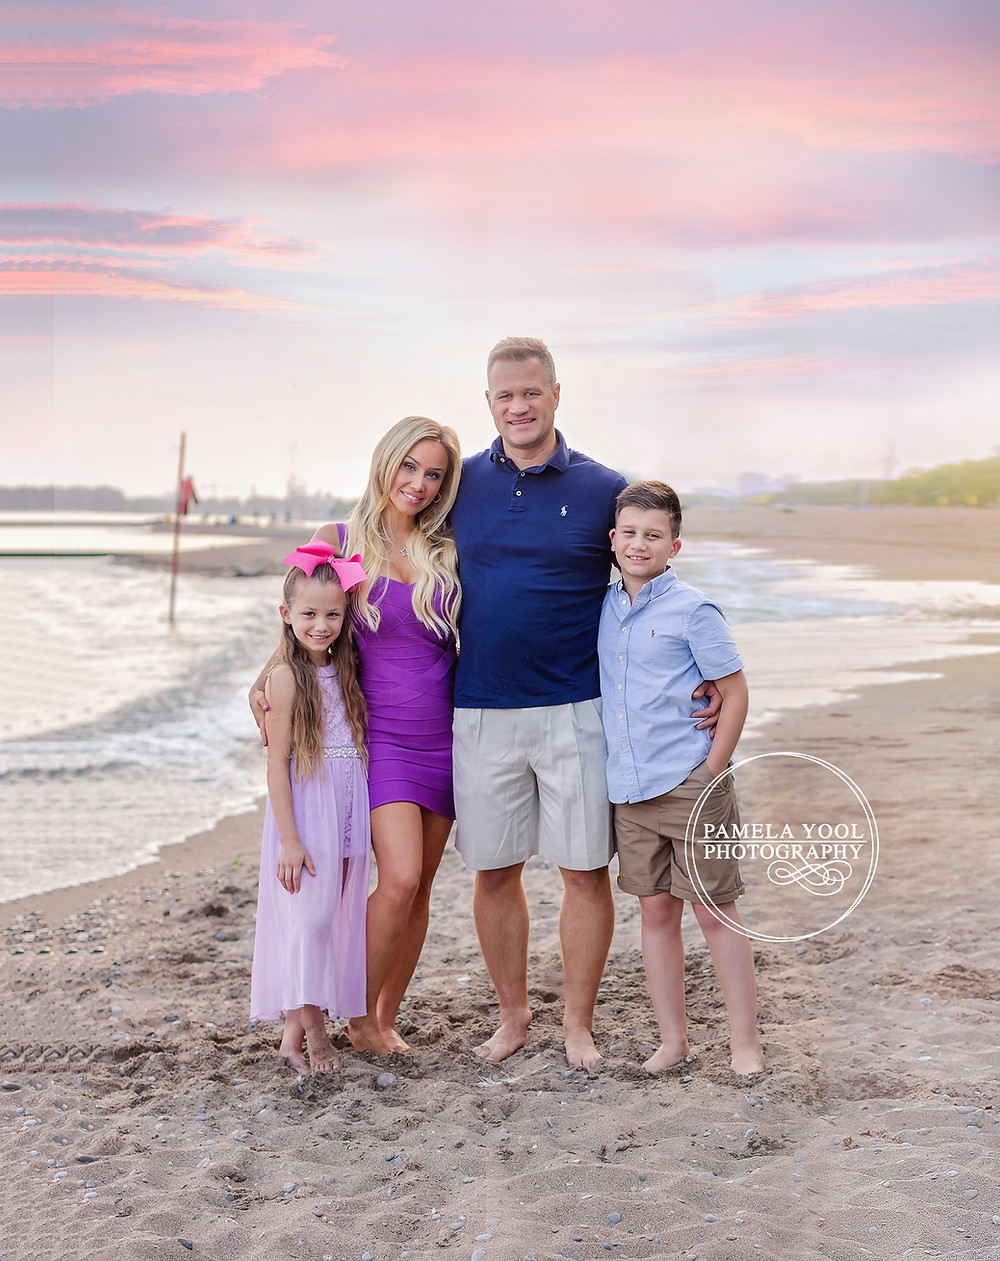 Toronto Beach Family Photoshoot